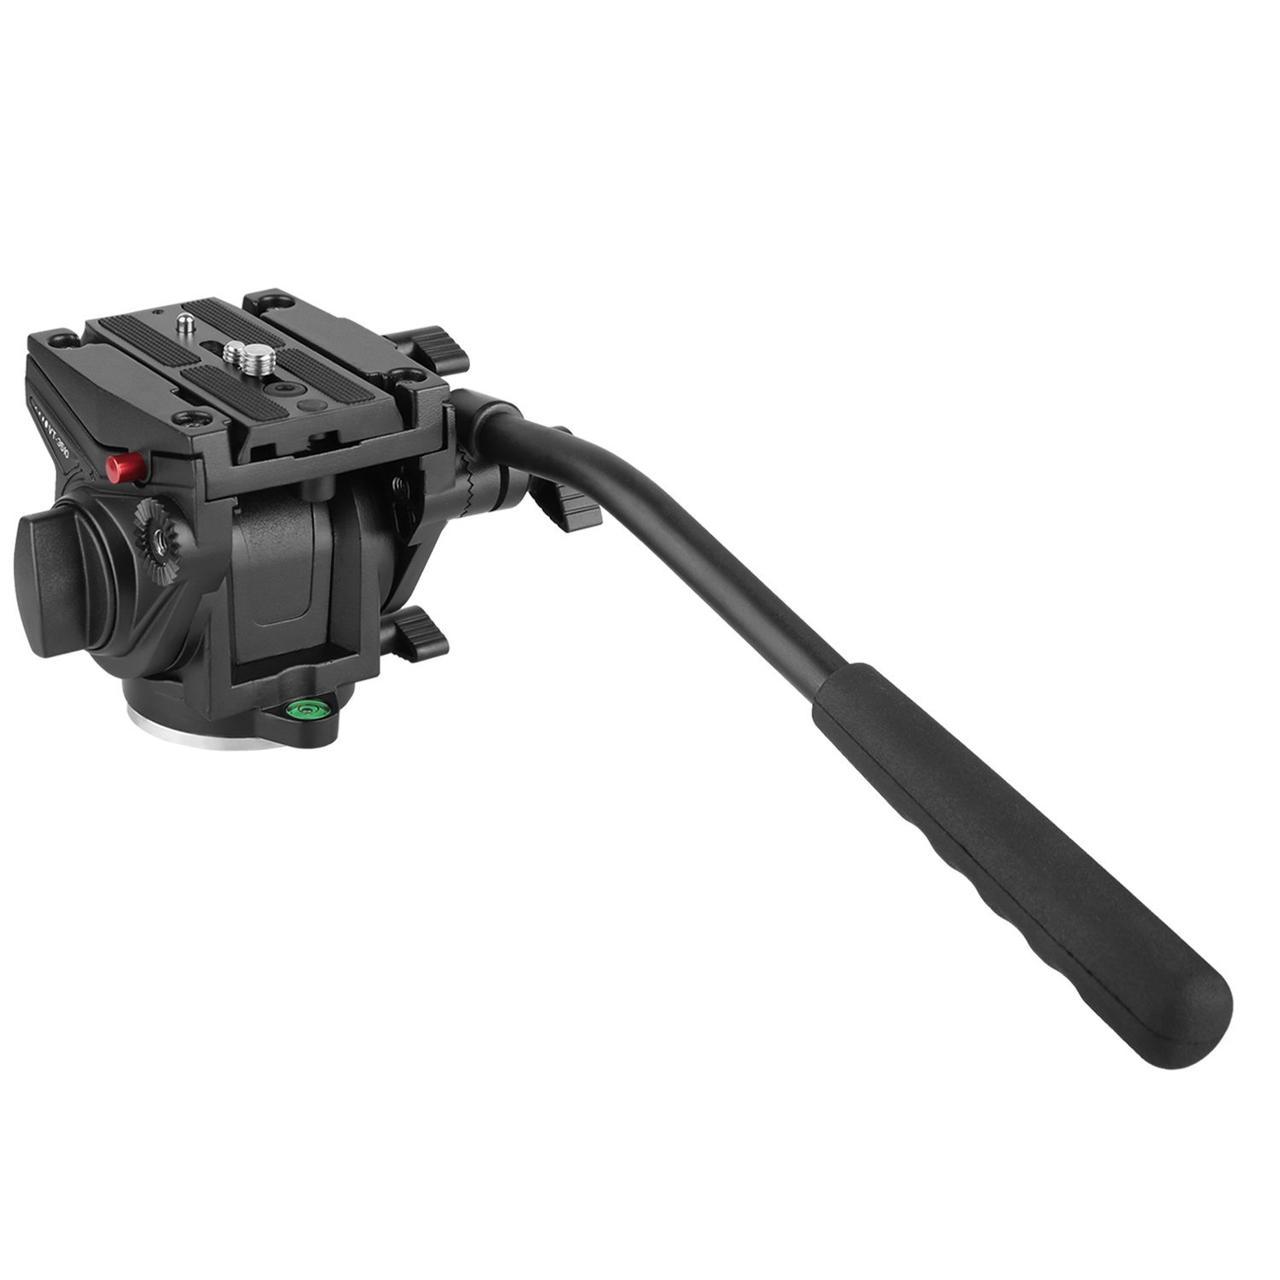 Видеоголова для штатива или монопода Kingjoy VT-3510 (голова аналог Manfrotto 701HDV)